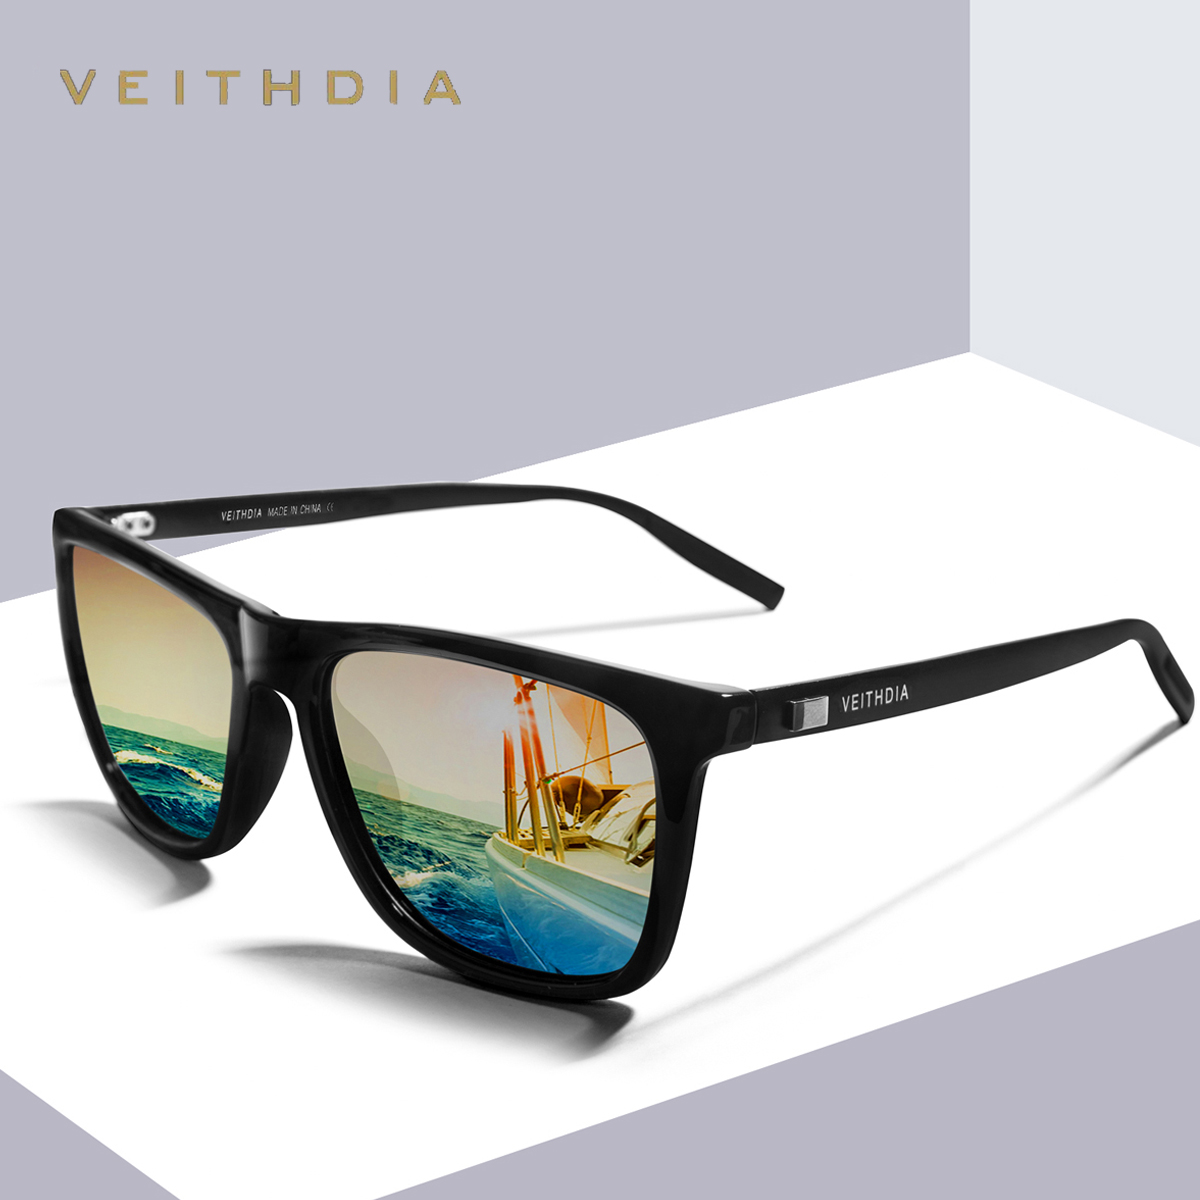 VEITHDIA ยี่ห้อ U Nisex R Etro อลูมิเนียม + TR90 แว่นกันแดดเลนส์โพลาไรซ์วินเทจอุปกรณ์แว่นตาอาทิตย์แว่นตาสำหรับผู้ชาย / ผู้หญิง 6108